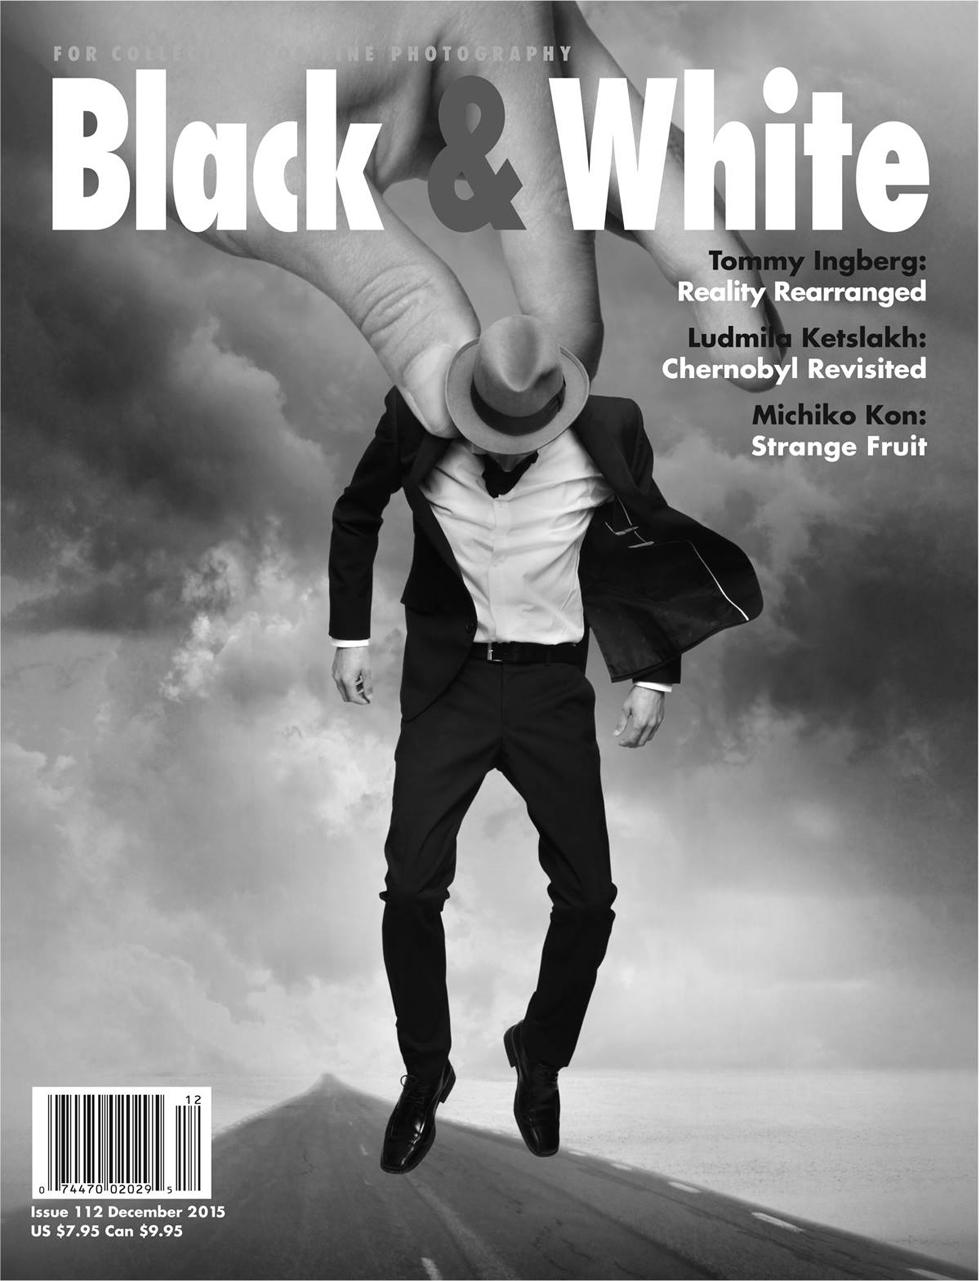 Bw magazine